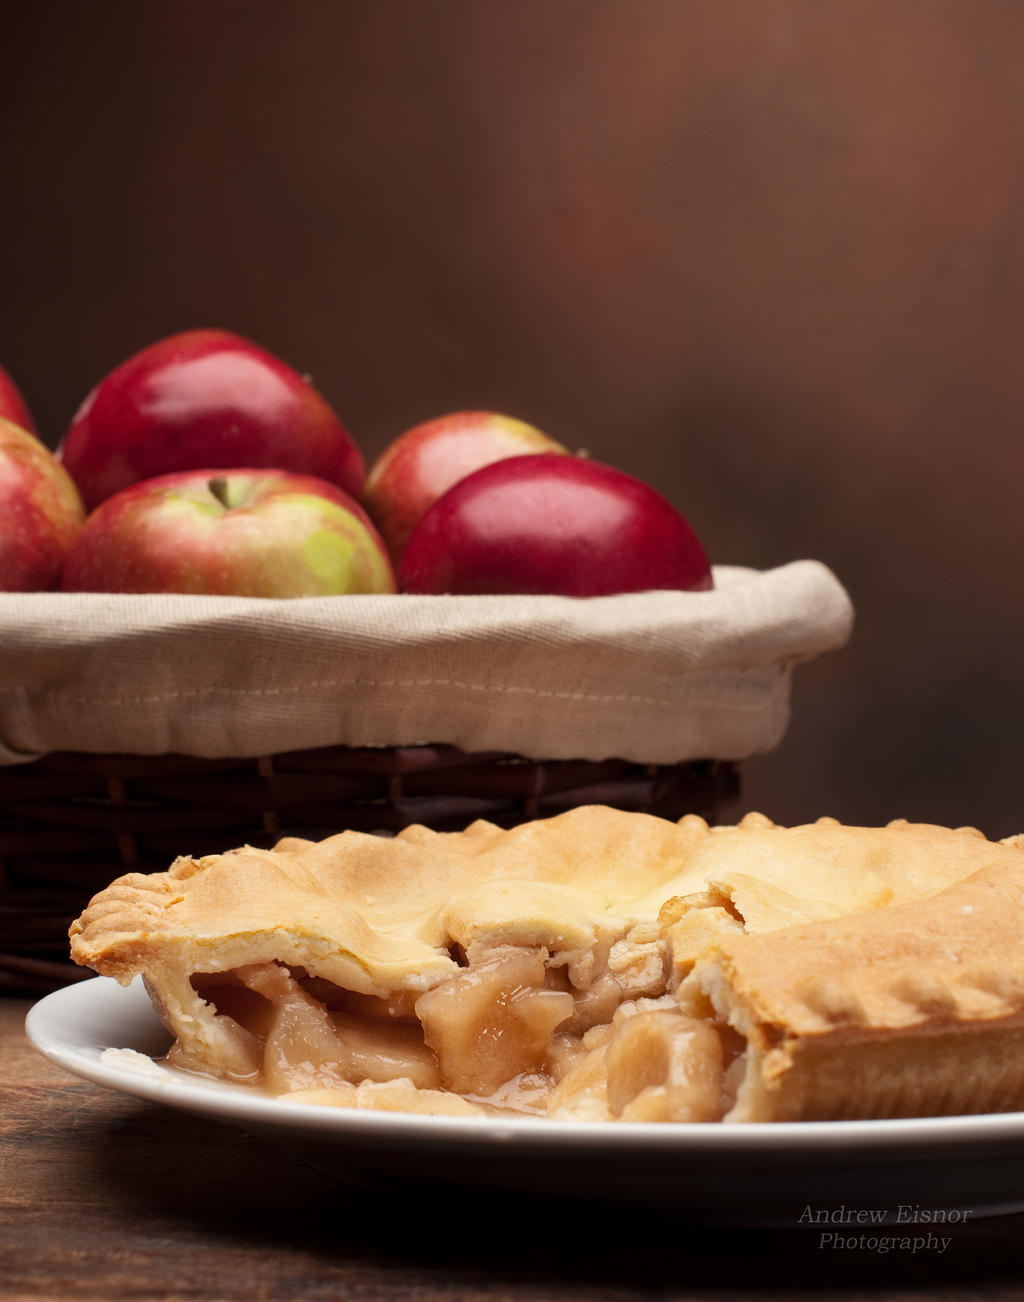 Apple Pie by AEisnor